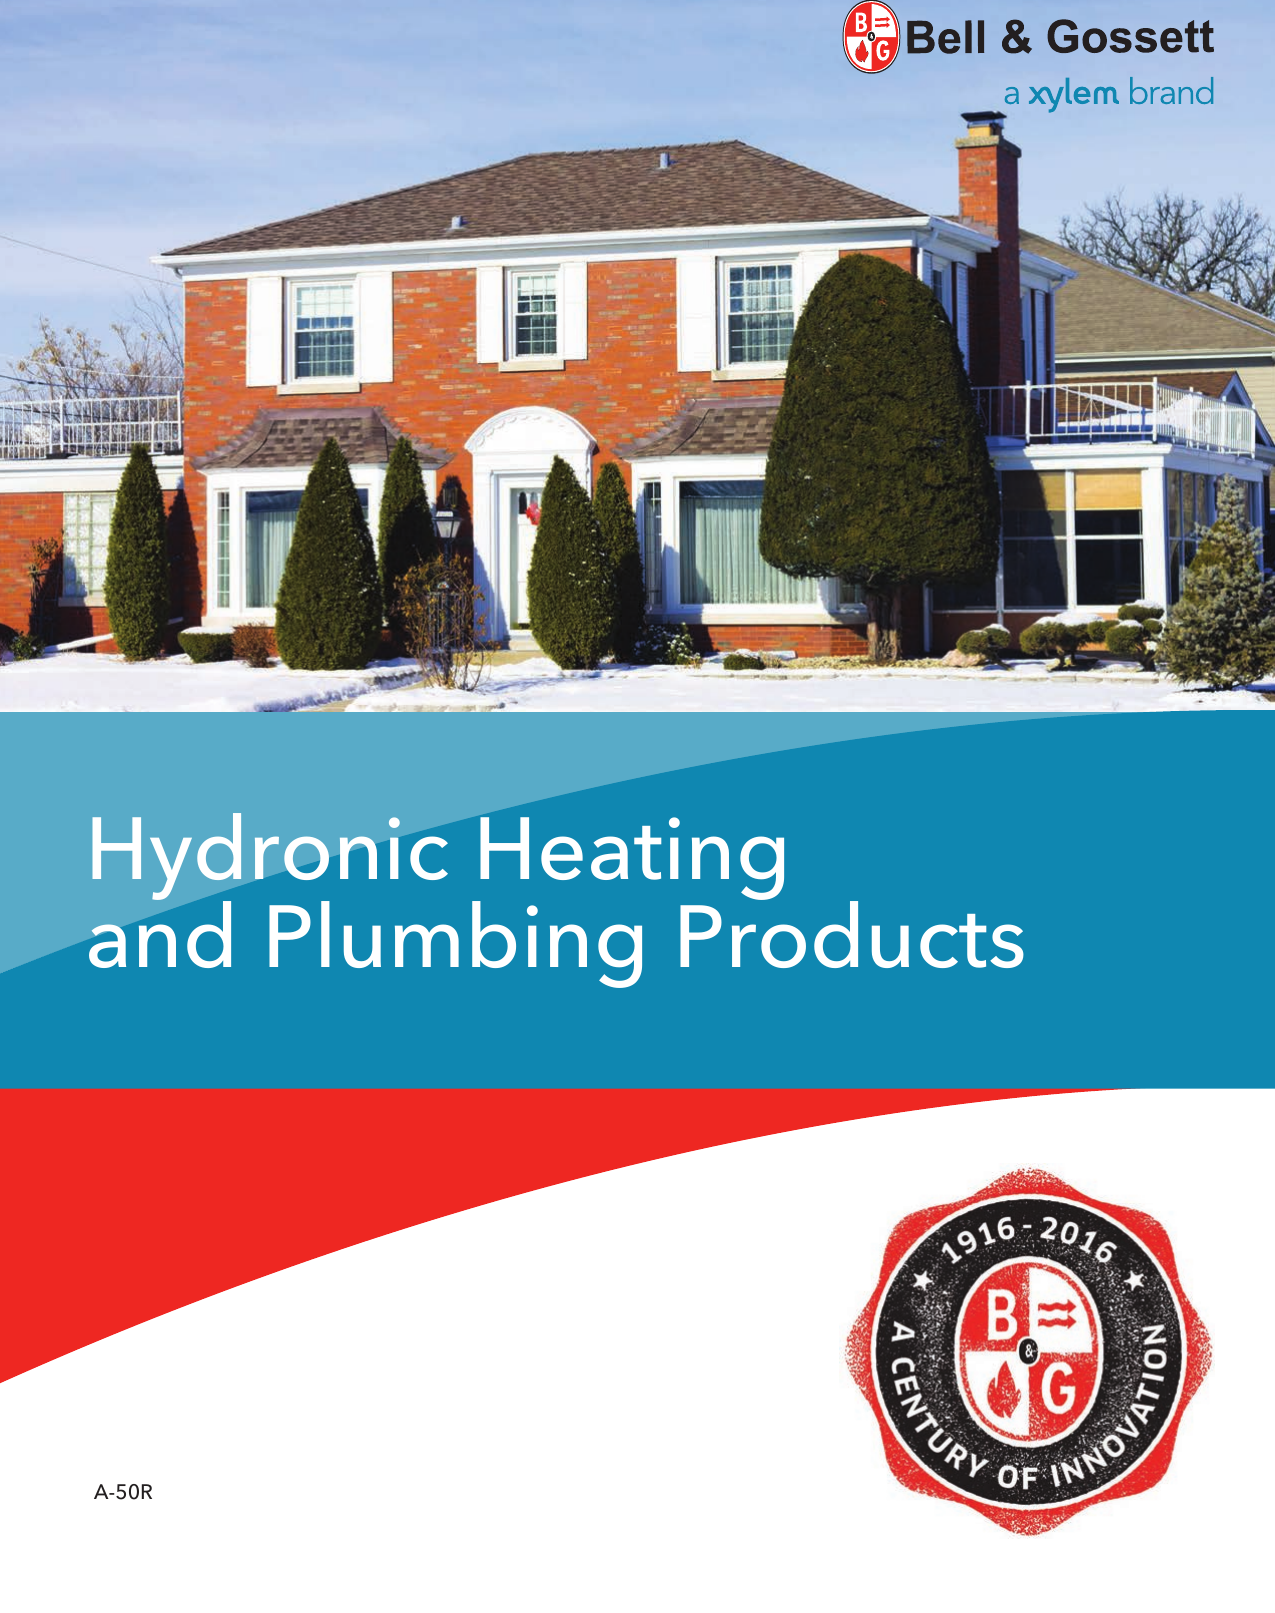 548320 1 Bg Hydronic Heating And Plumbing Brochure Bell Amp Gossett Wiring Diagram